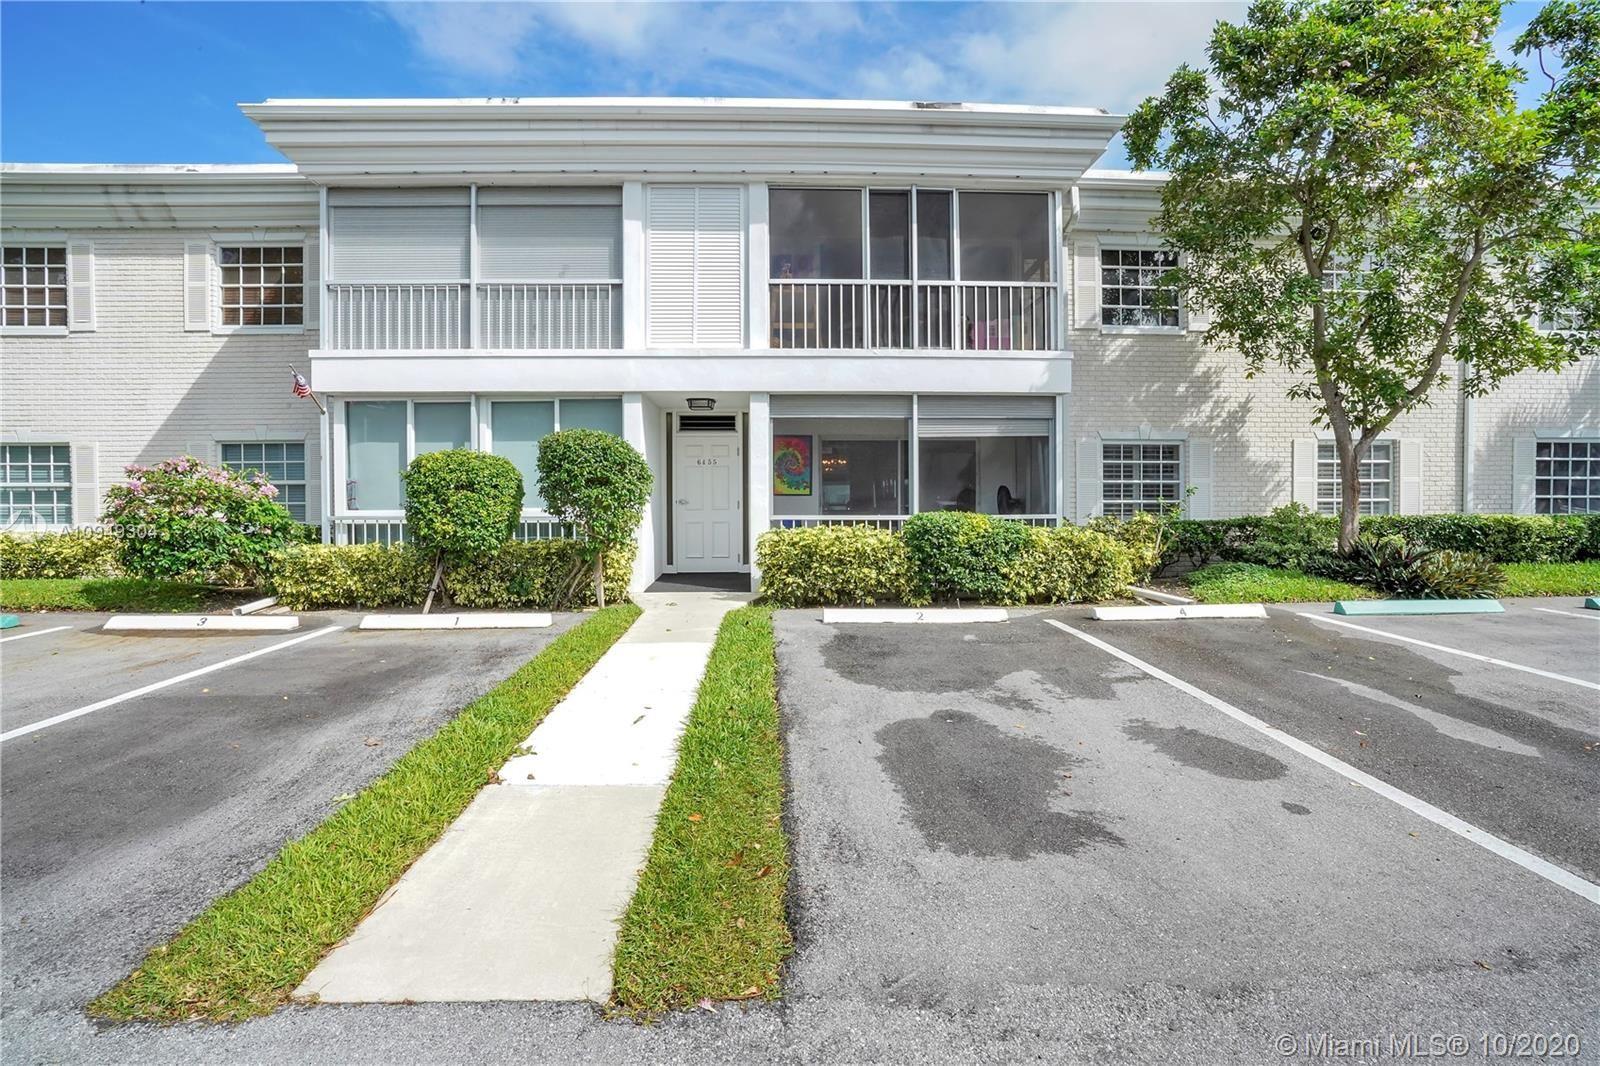 6455 Bay Club Dr #2, Fort Lauderdale, FL 33308 - #: A10949304